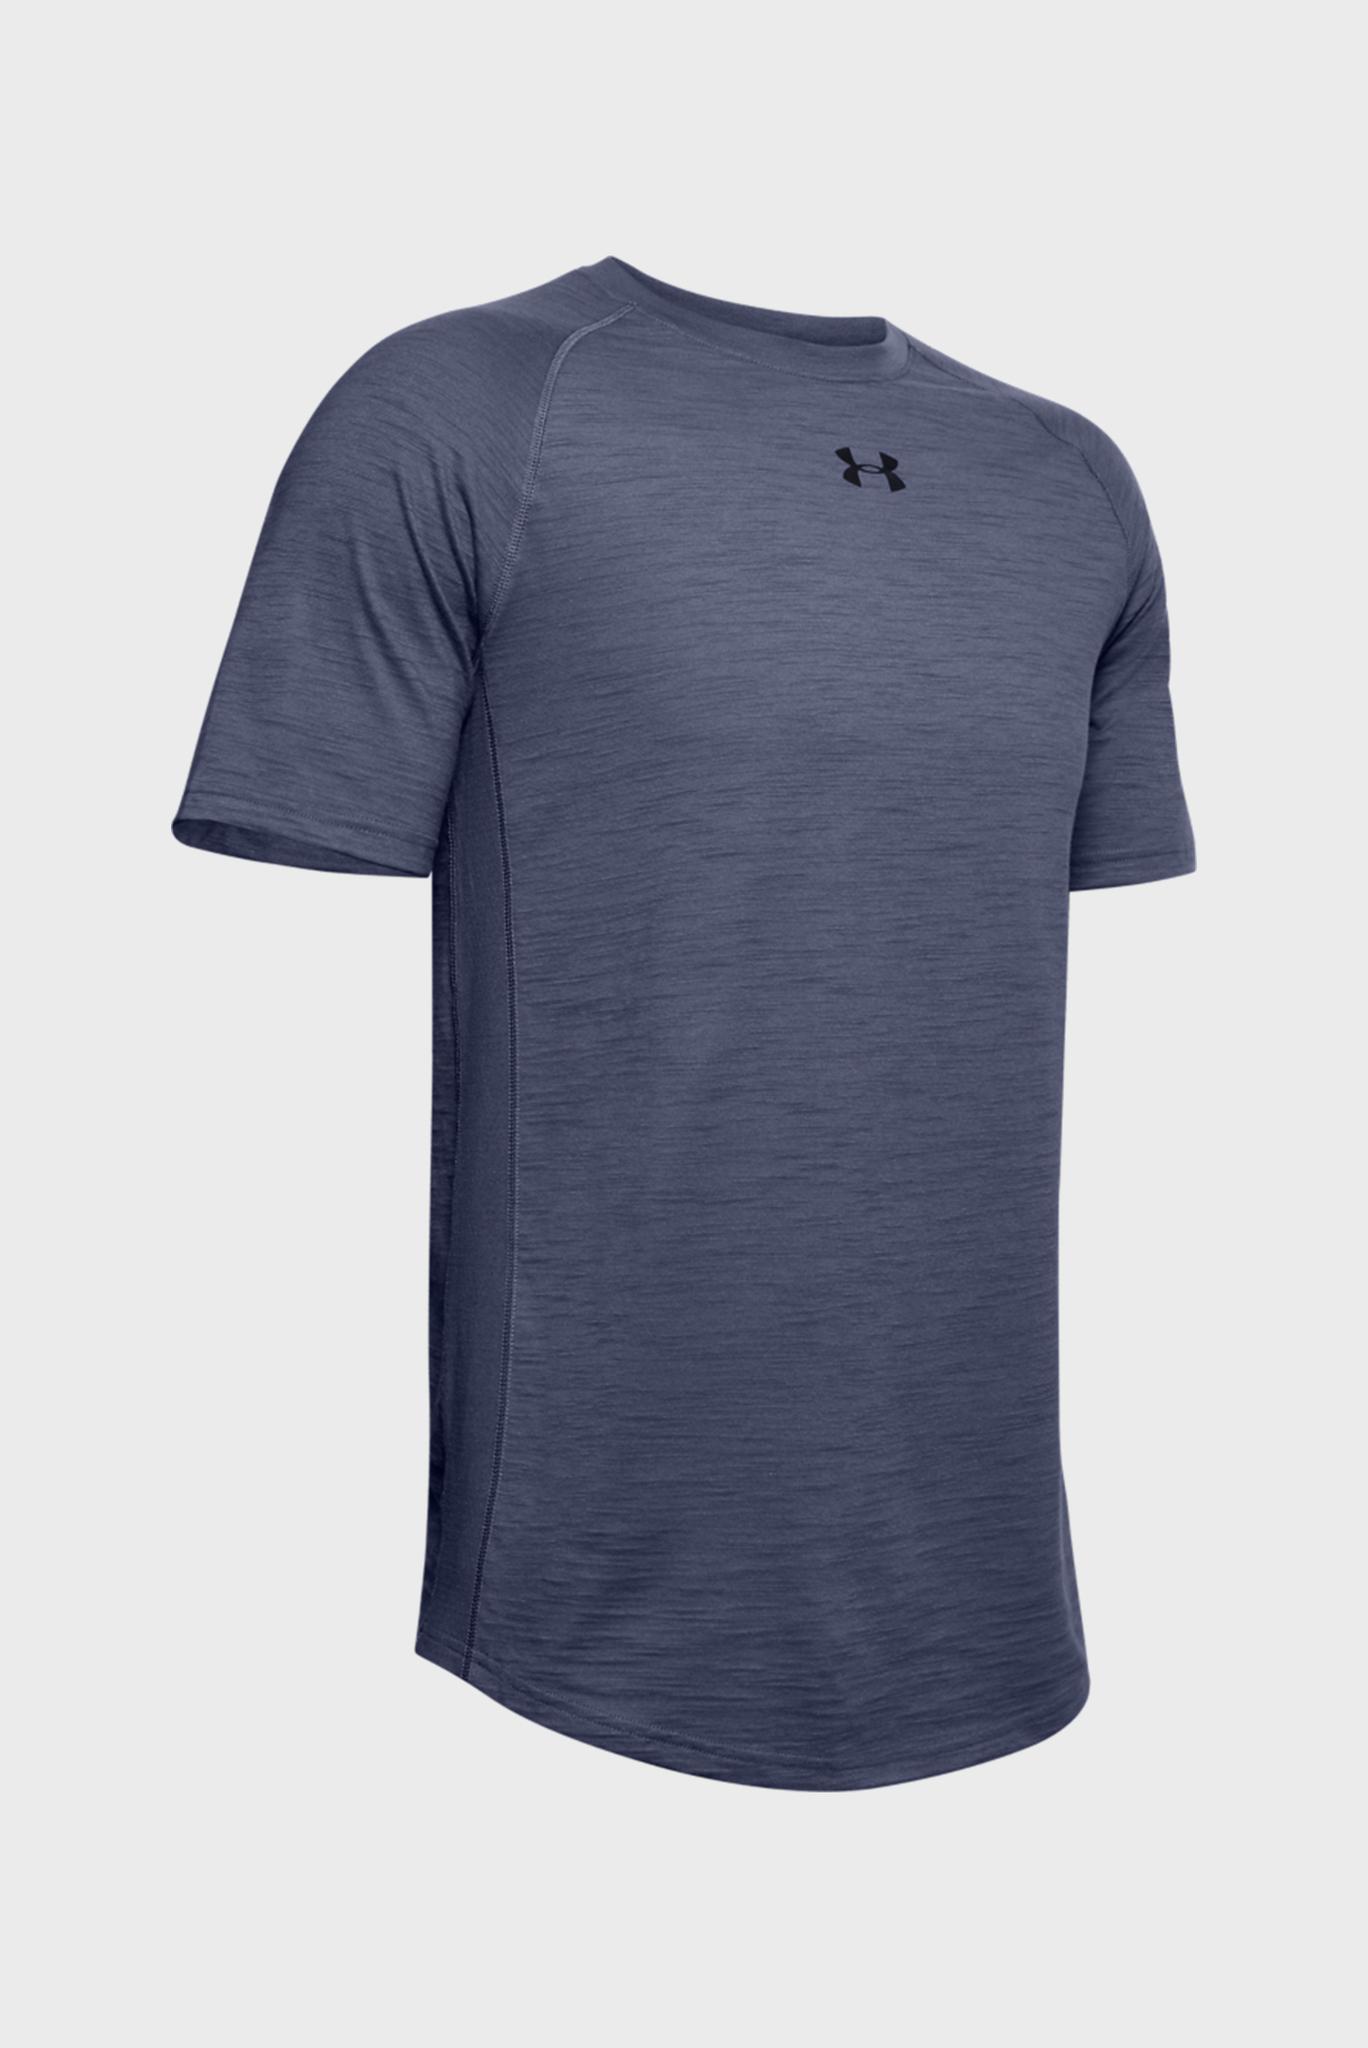 Мужская синяя спортивная футболка Charged Cotton SS Under Armour